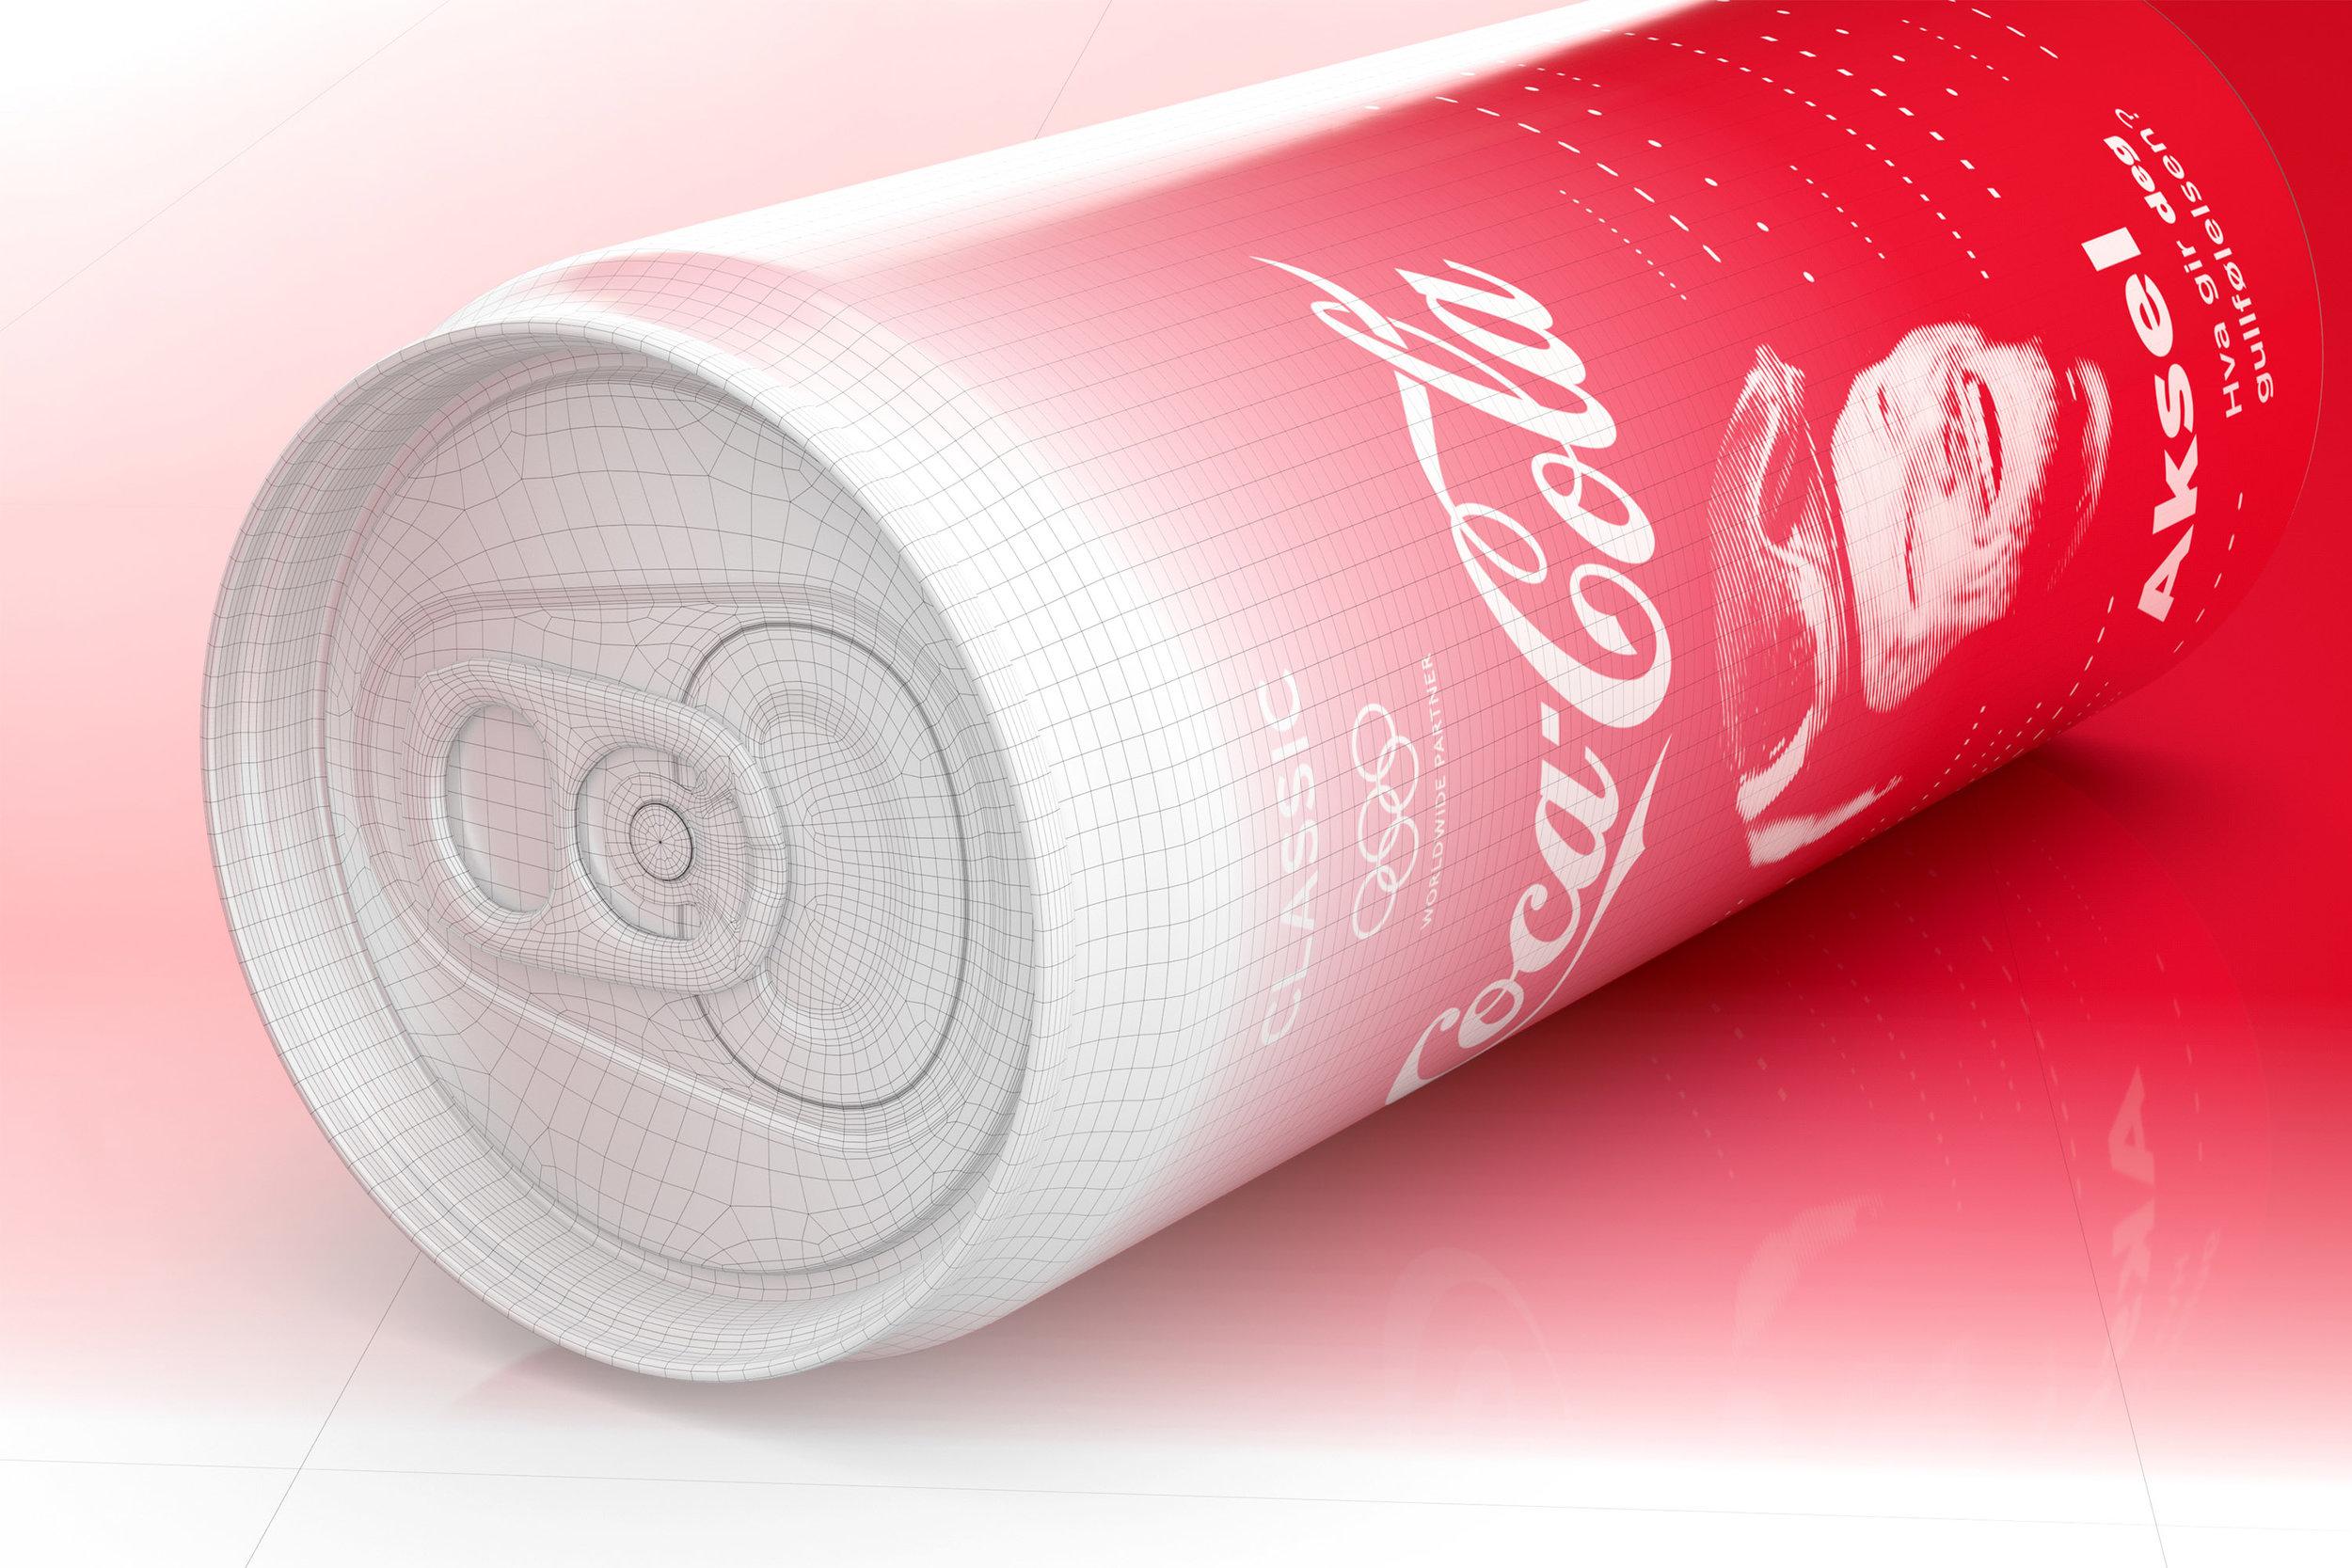 Coca Cola Classic - Top - Metric - JHåland_1-wire.jpg